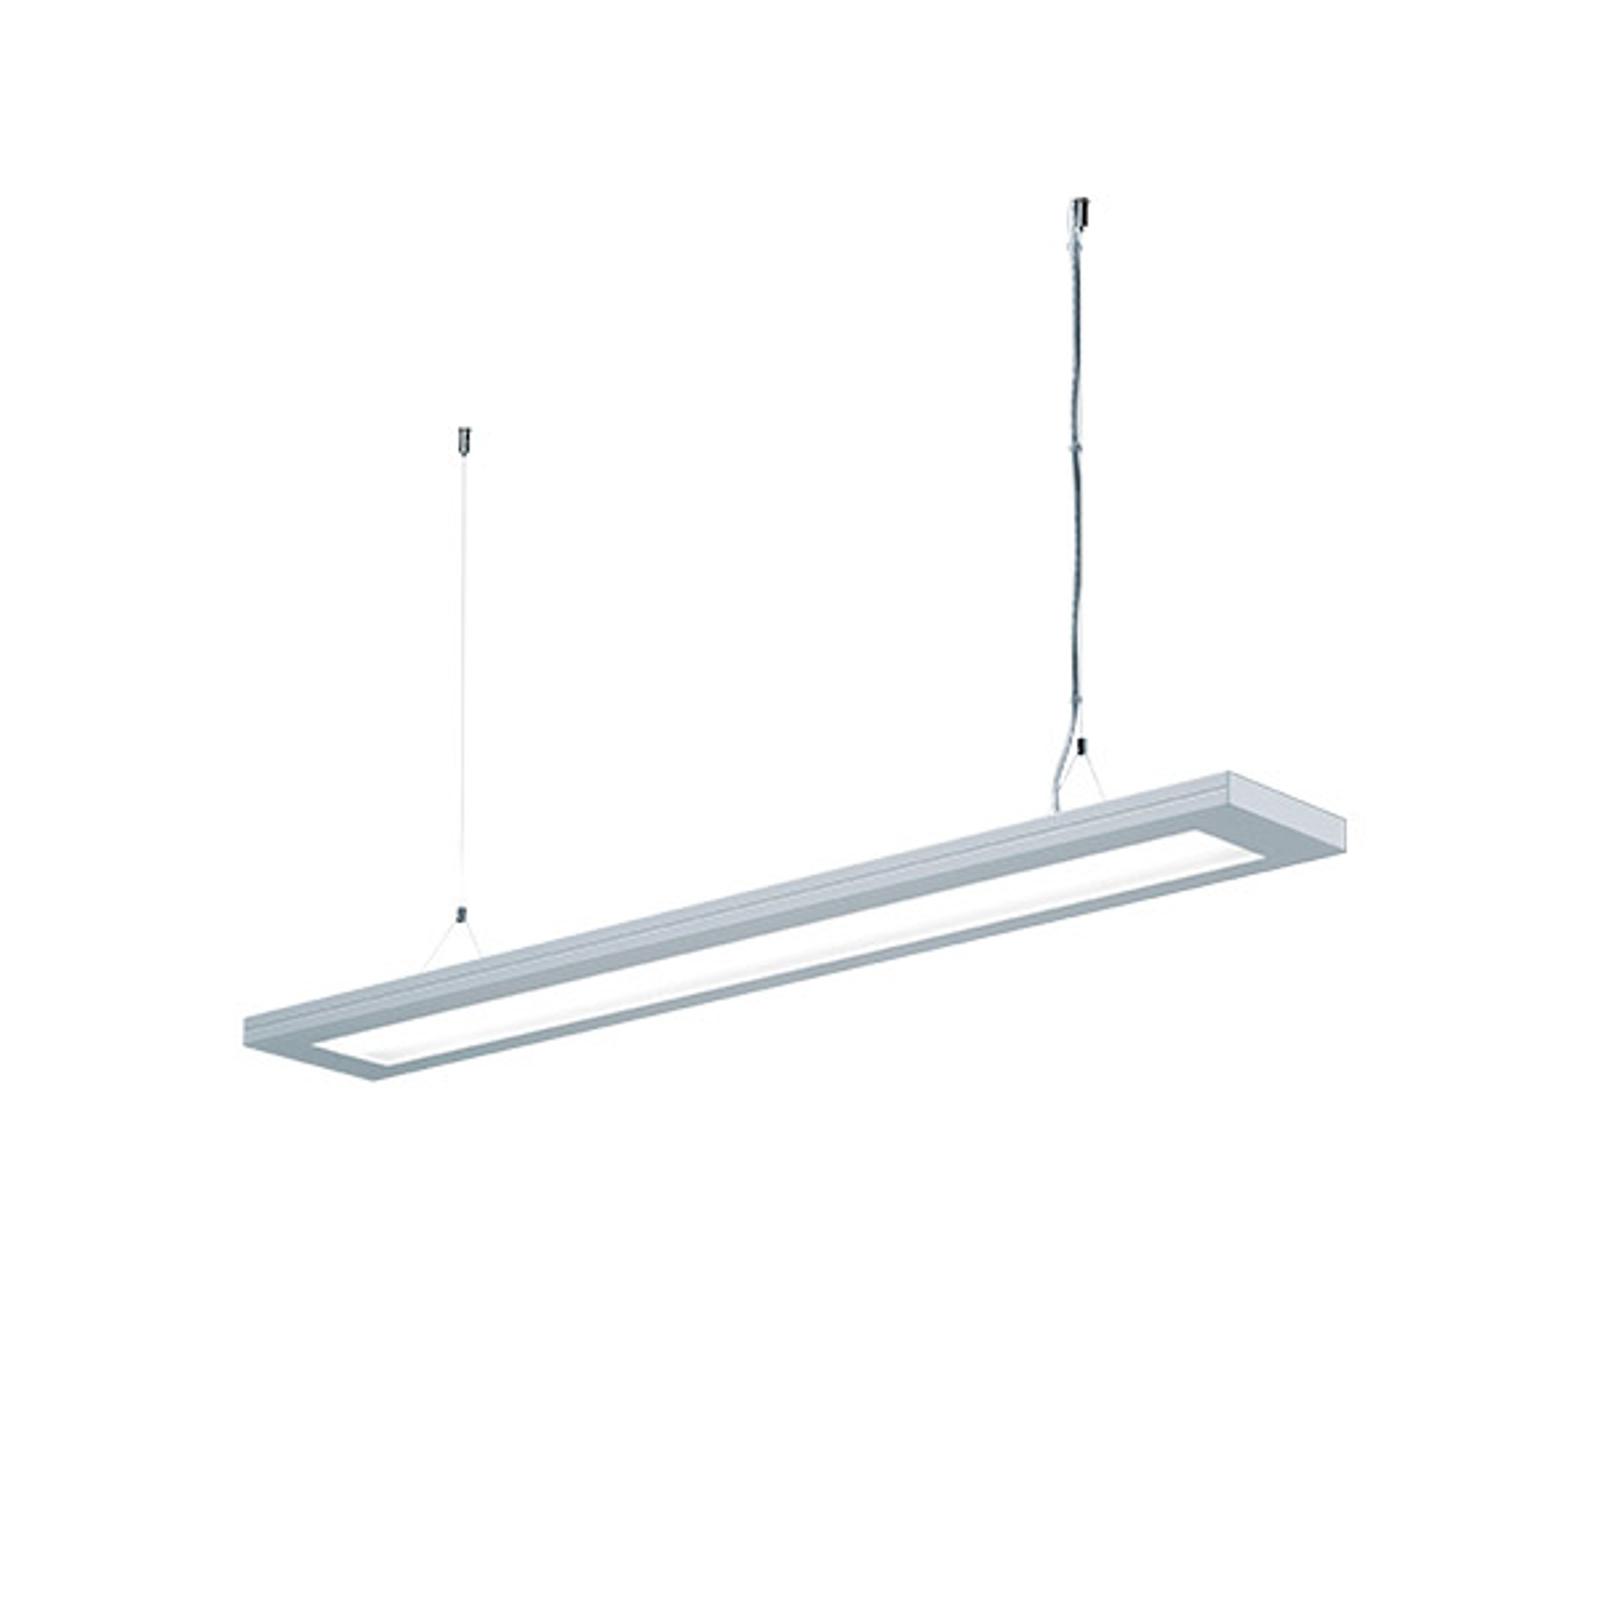 LED-Hängeleuchte Lavigo DPP 16000/840/D EVG weiß